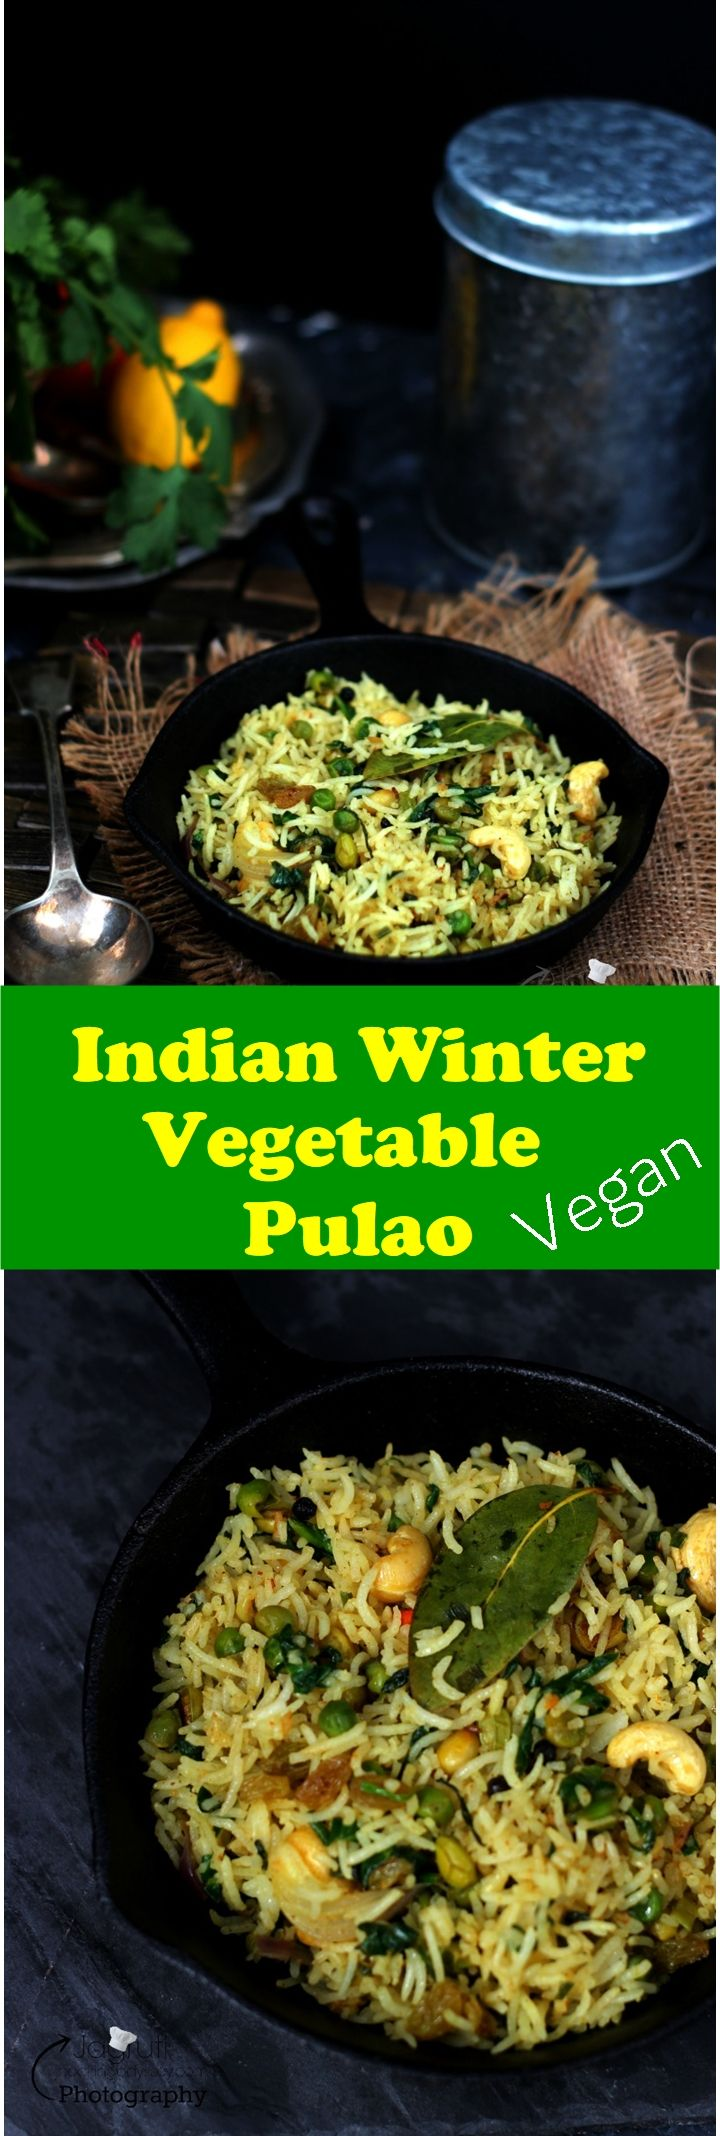 Vegan Indian Winter Vegetable Pulao